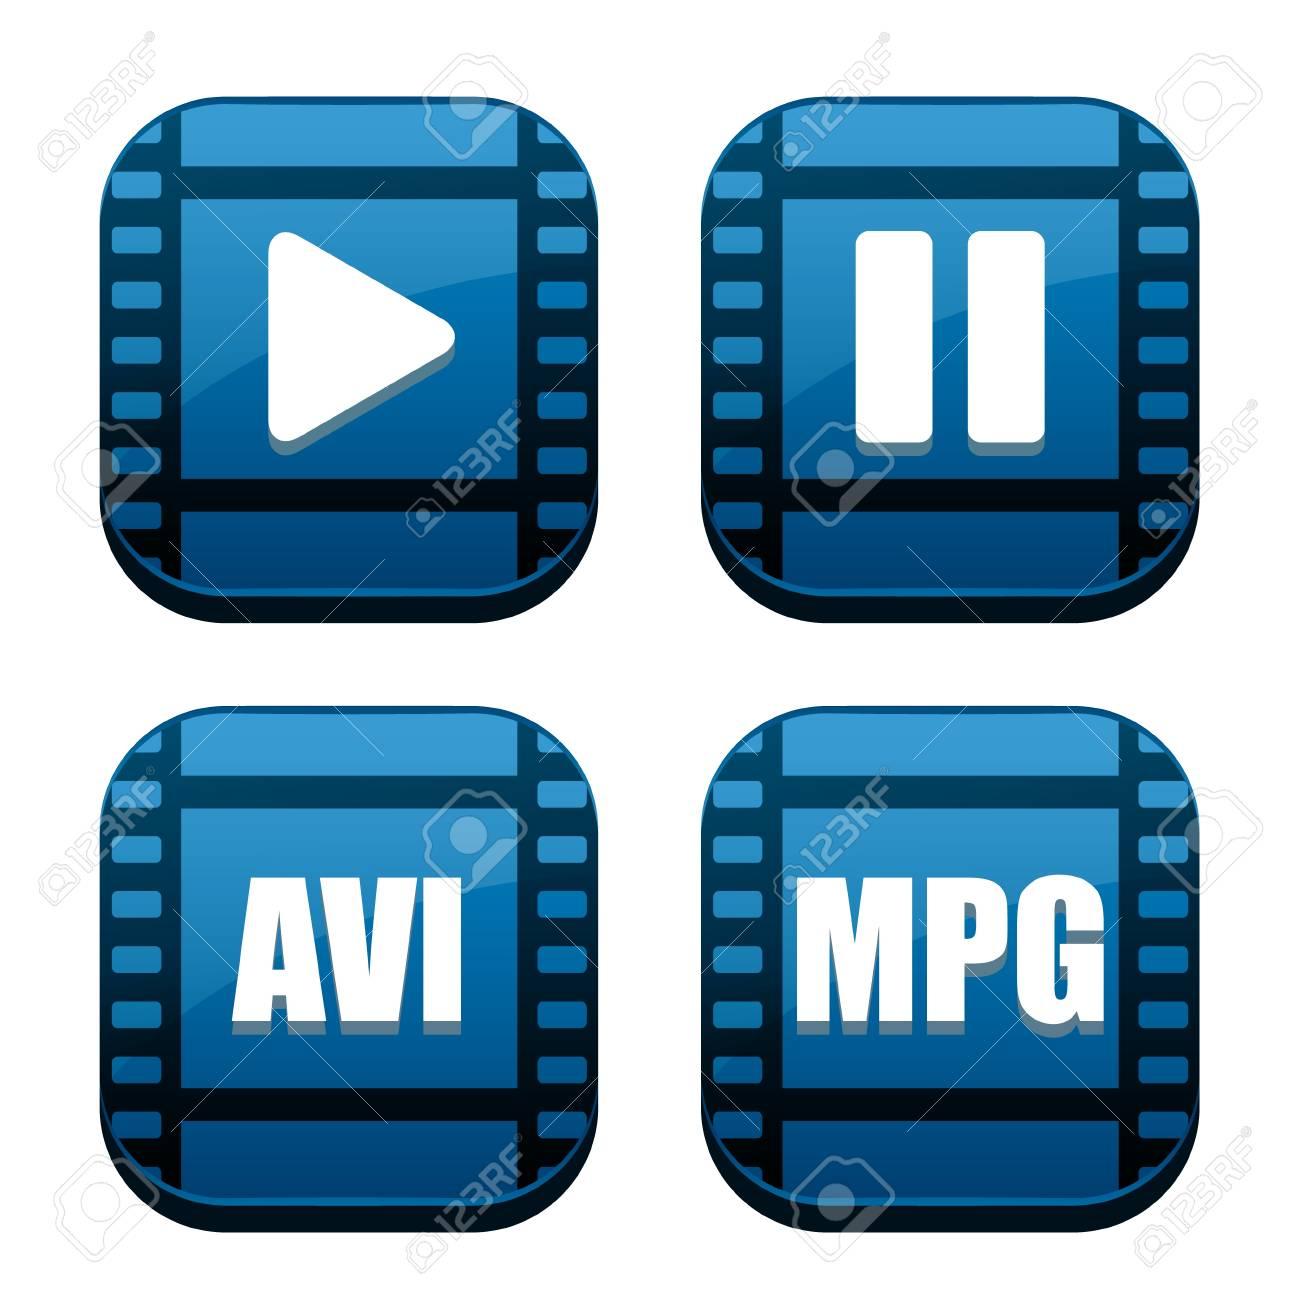 Set of four movie blue icons Stock Photo - 11809119